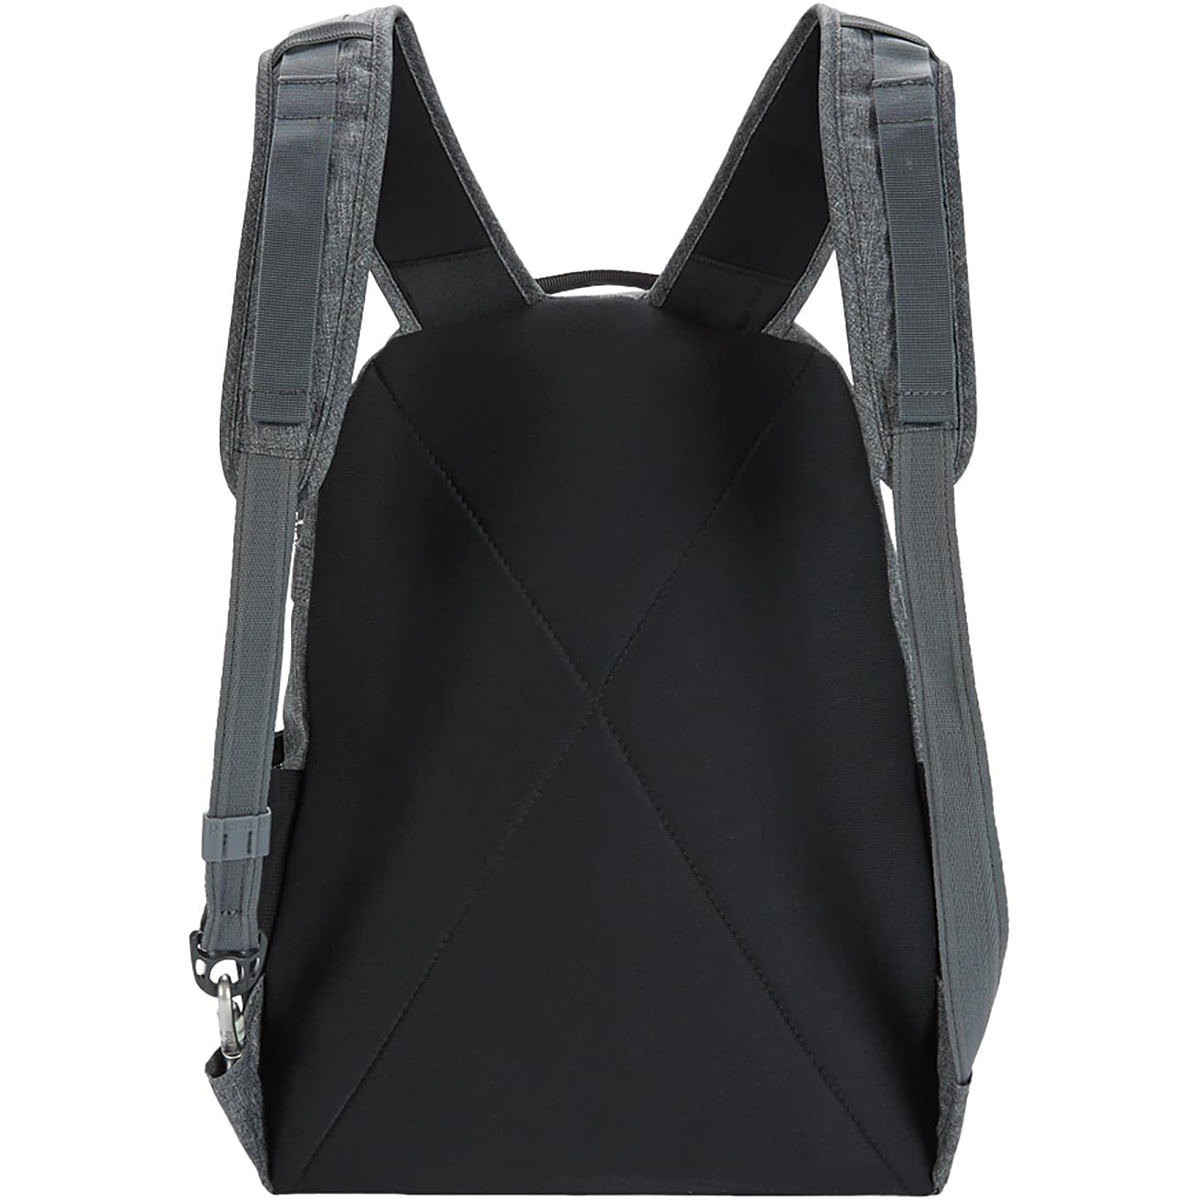 PacSafe-MetroSafe-LS350-Anti-Theft-15L-Backpack miniature 9